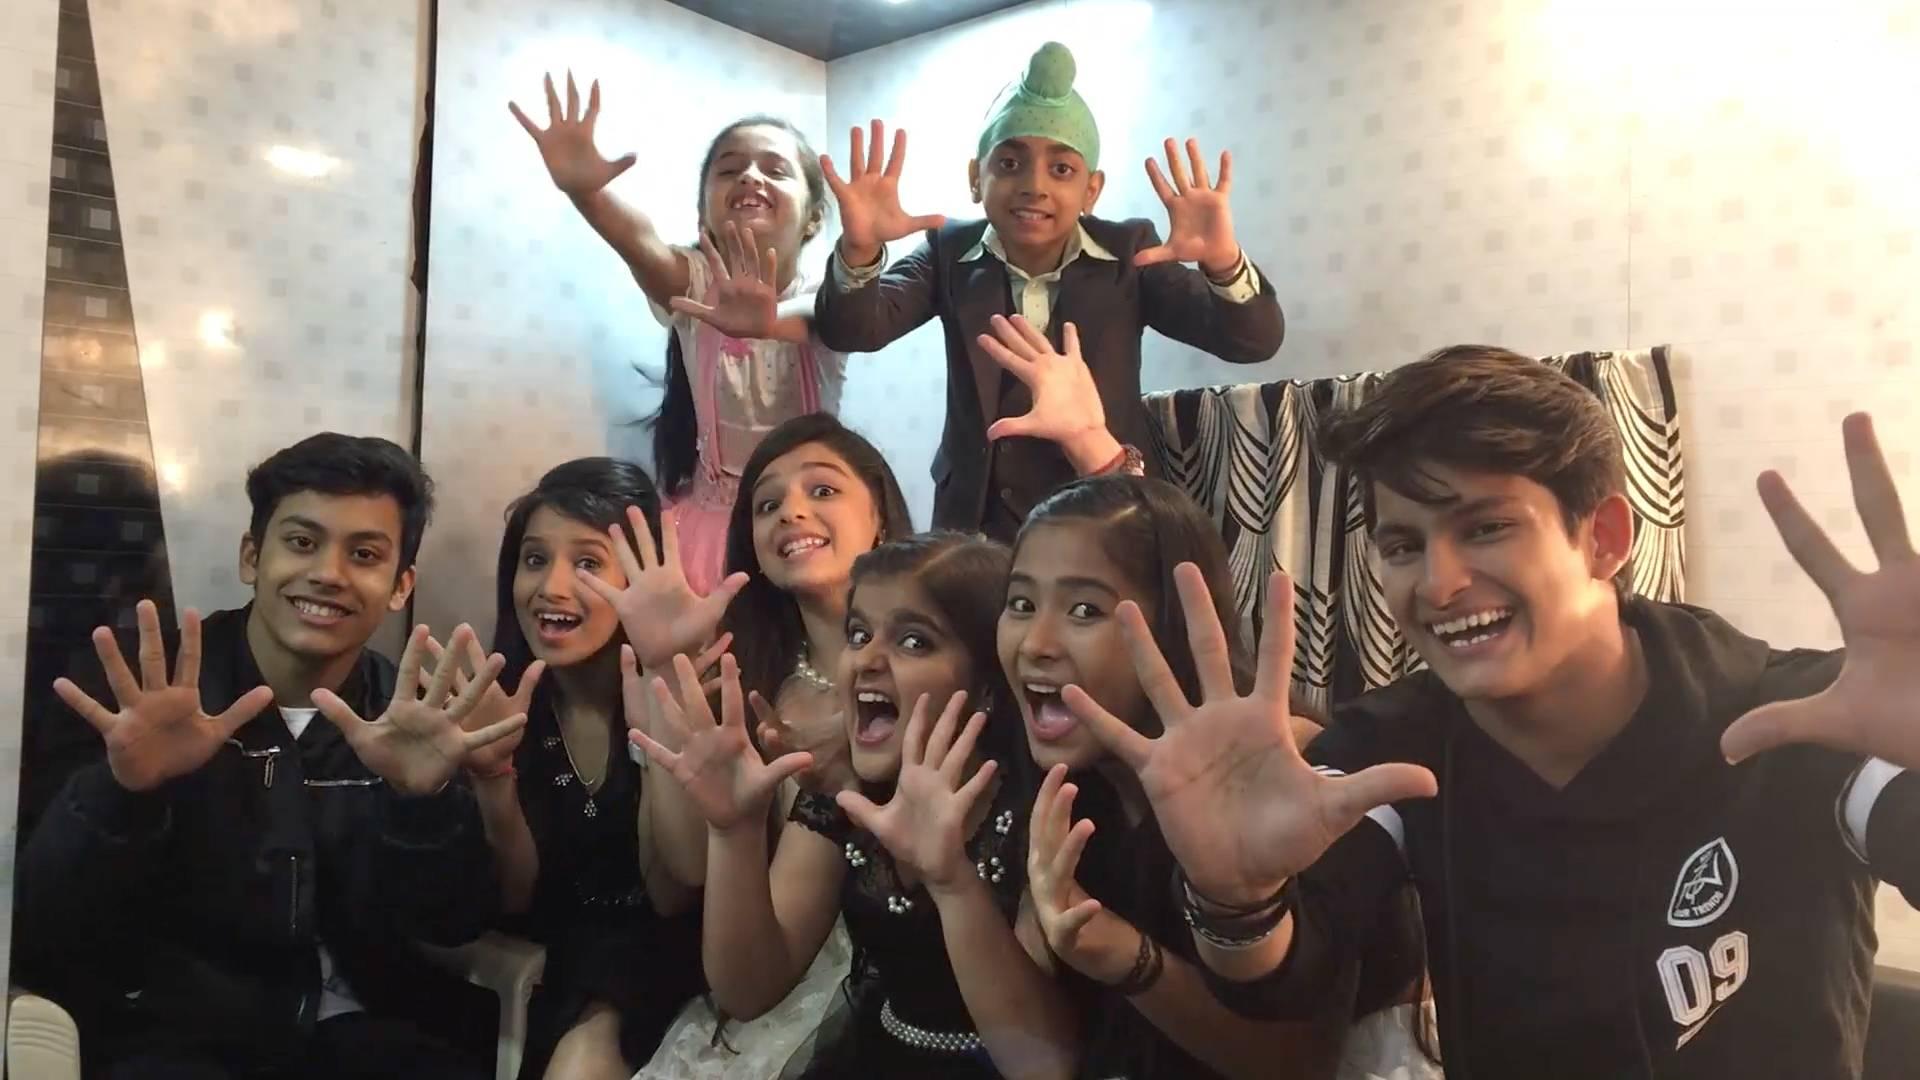 JDJ9 kids shares their experience about Bigg Boss 10!